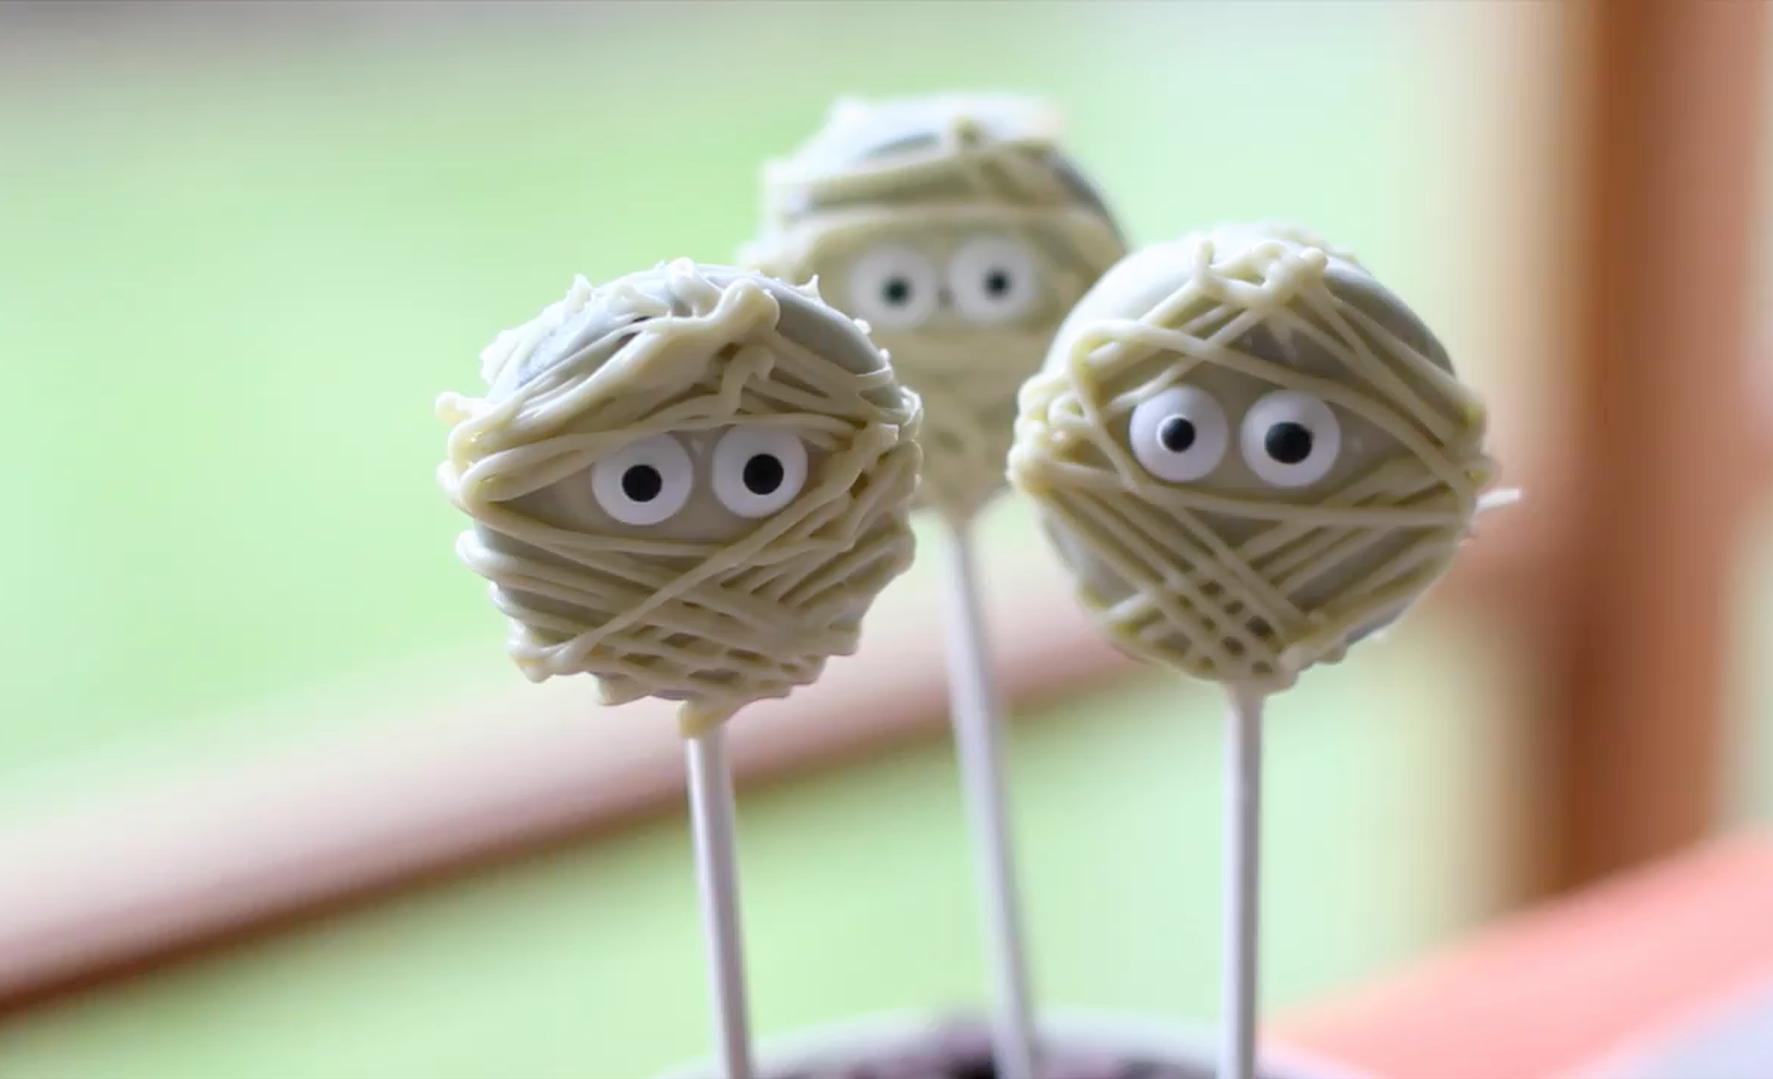 Mummy pops | 15 Easy Halloween Cookie Ideas | Her Beauty